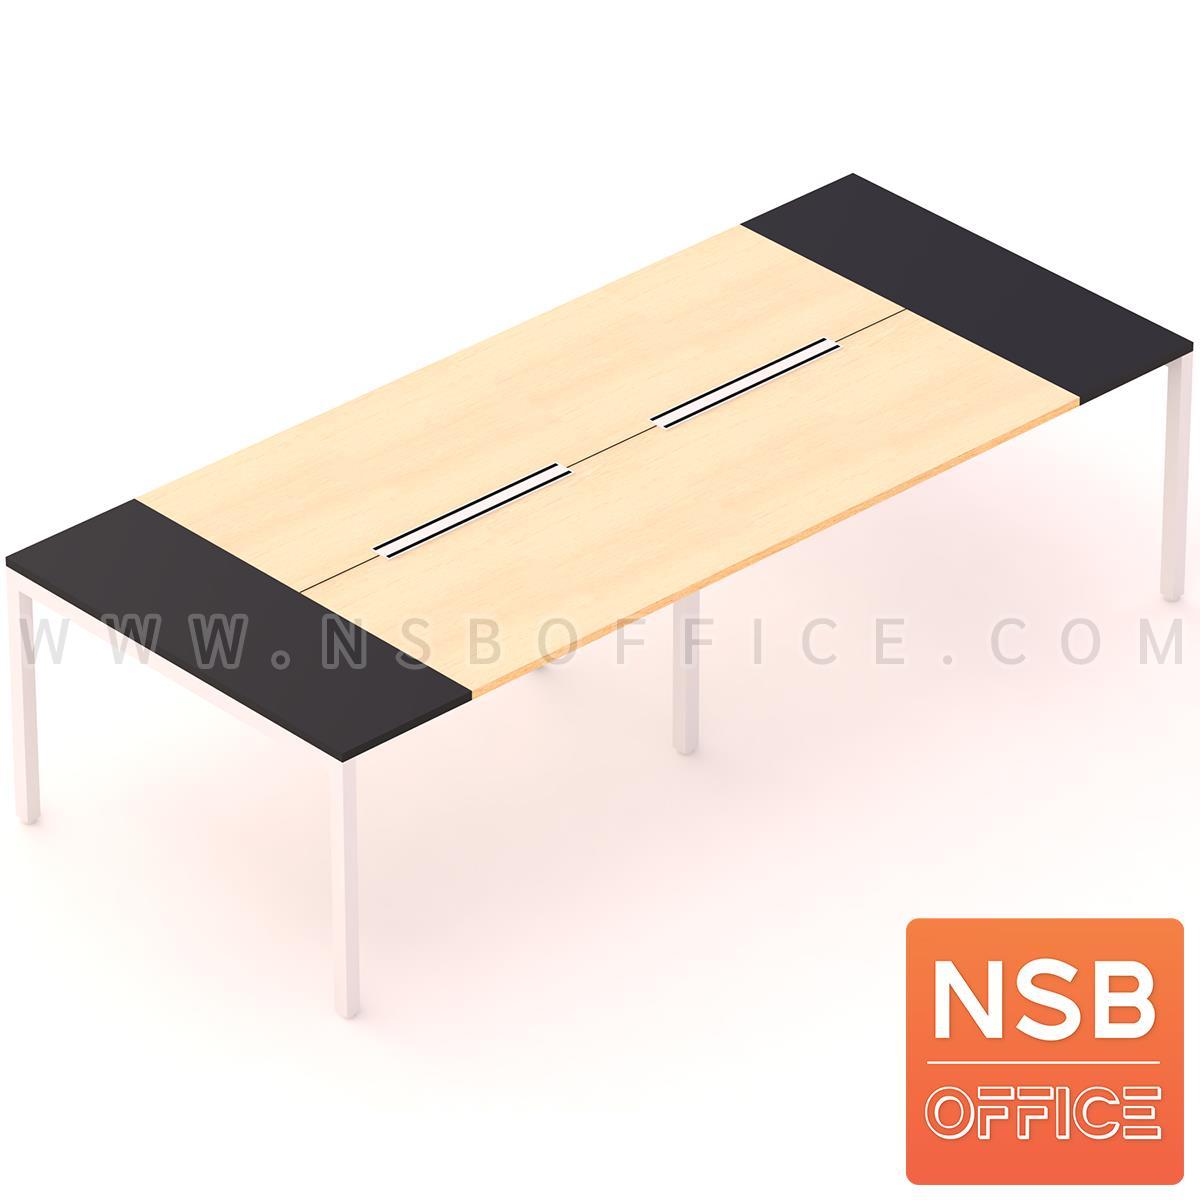 A05A175:โต๊ะประชุมทรงสี่เหลี่ยม 120D cm. NSB-SQ12  พร้อม popup แบบสองทาง